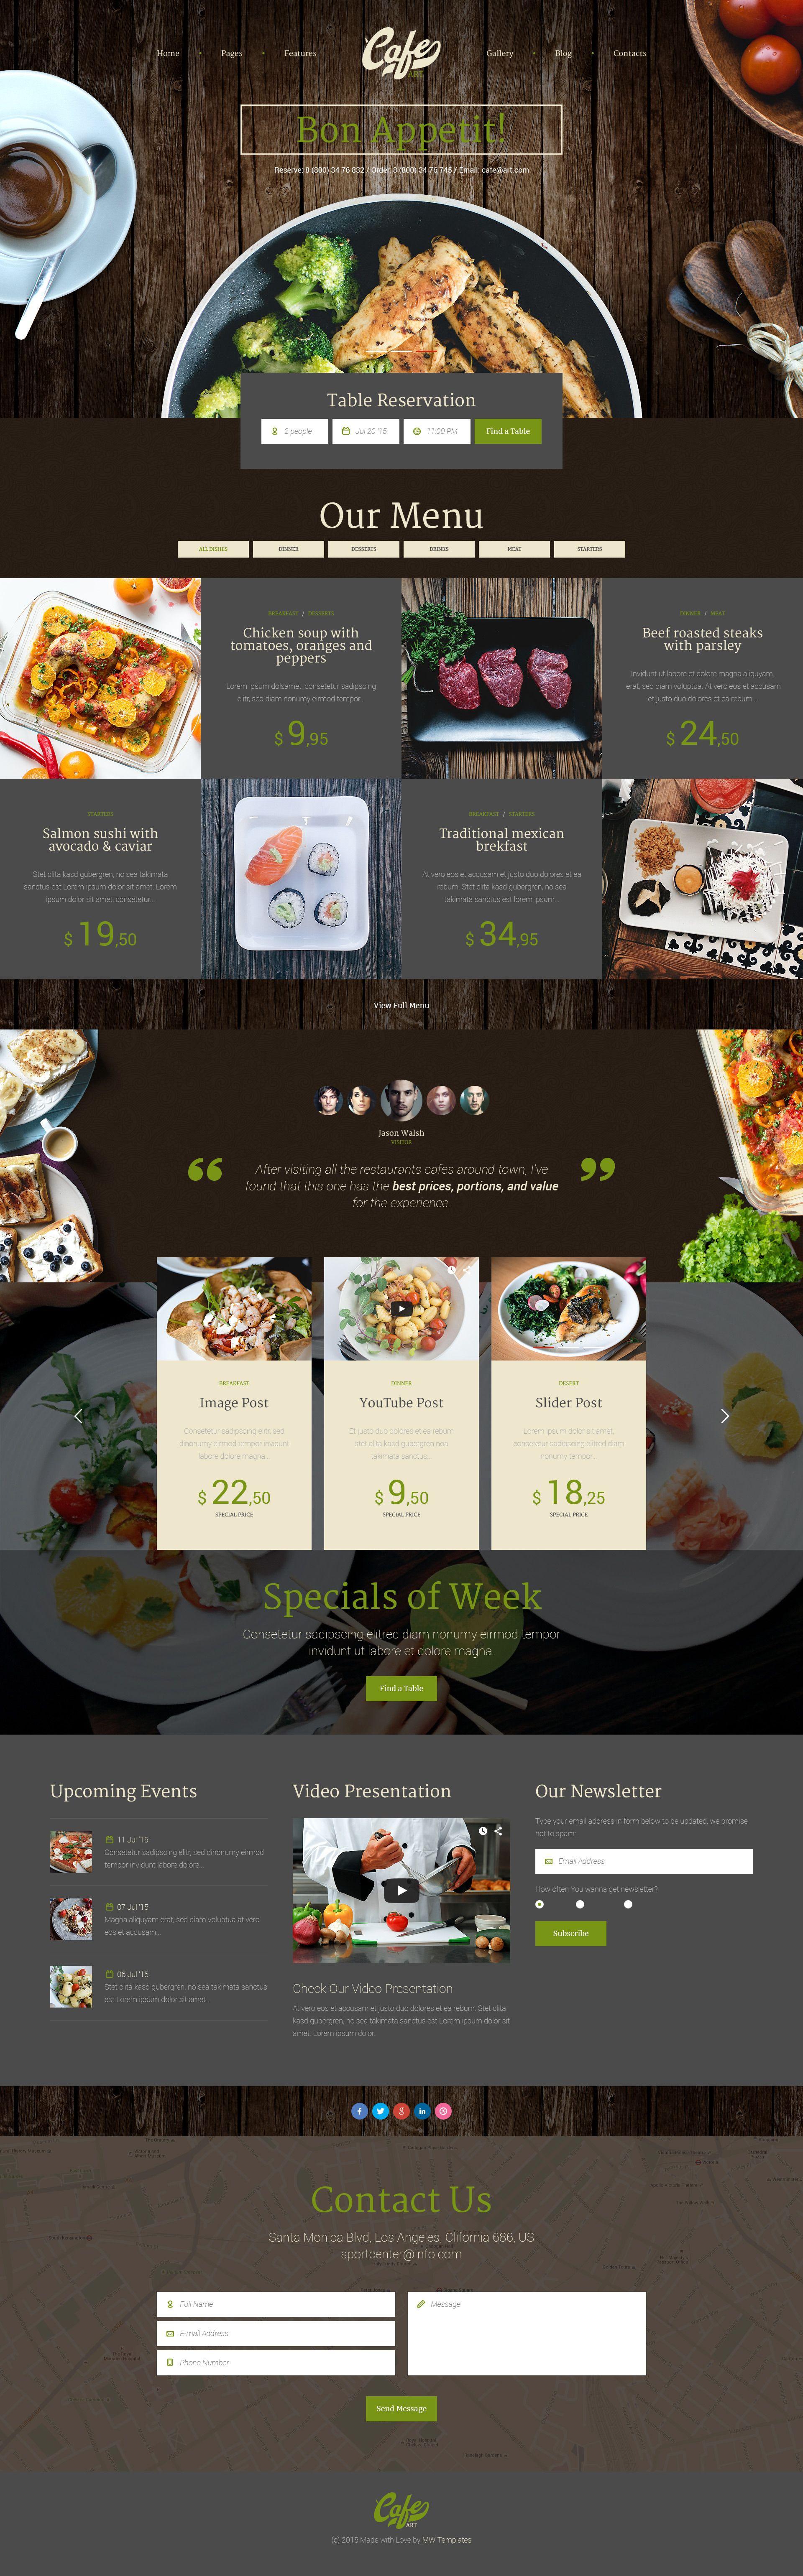 47 Most Creative Wordpress Themes 2020 Updated Web Layout Design Food Web Design Web Design